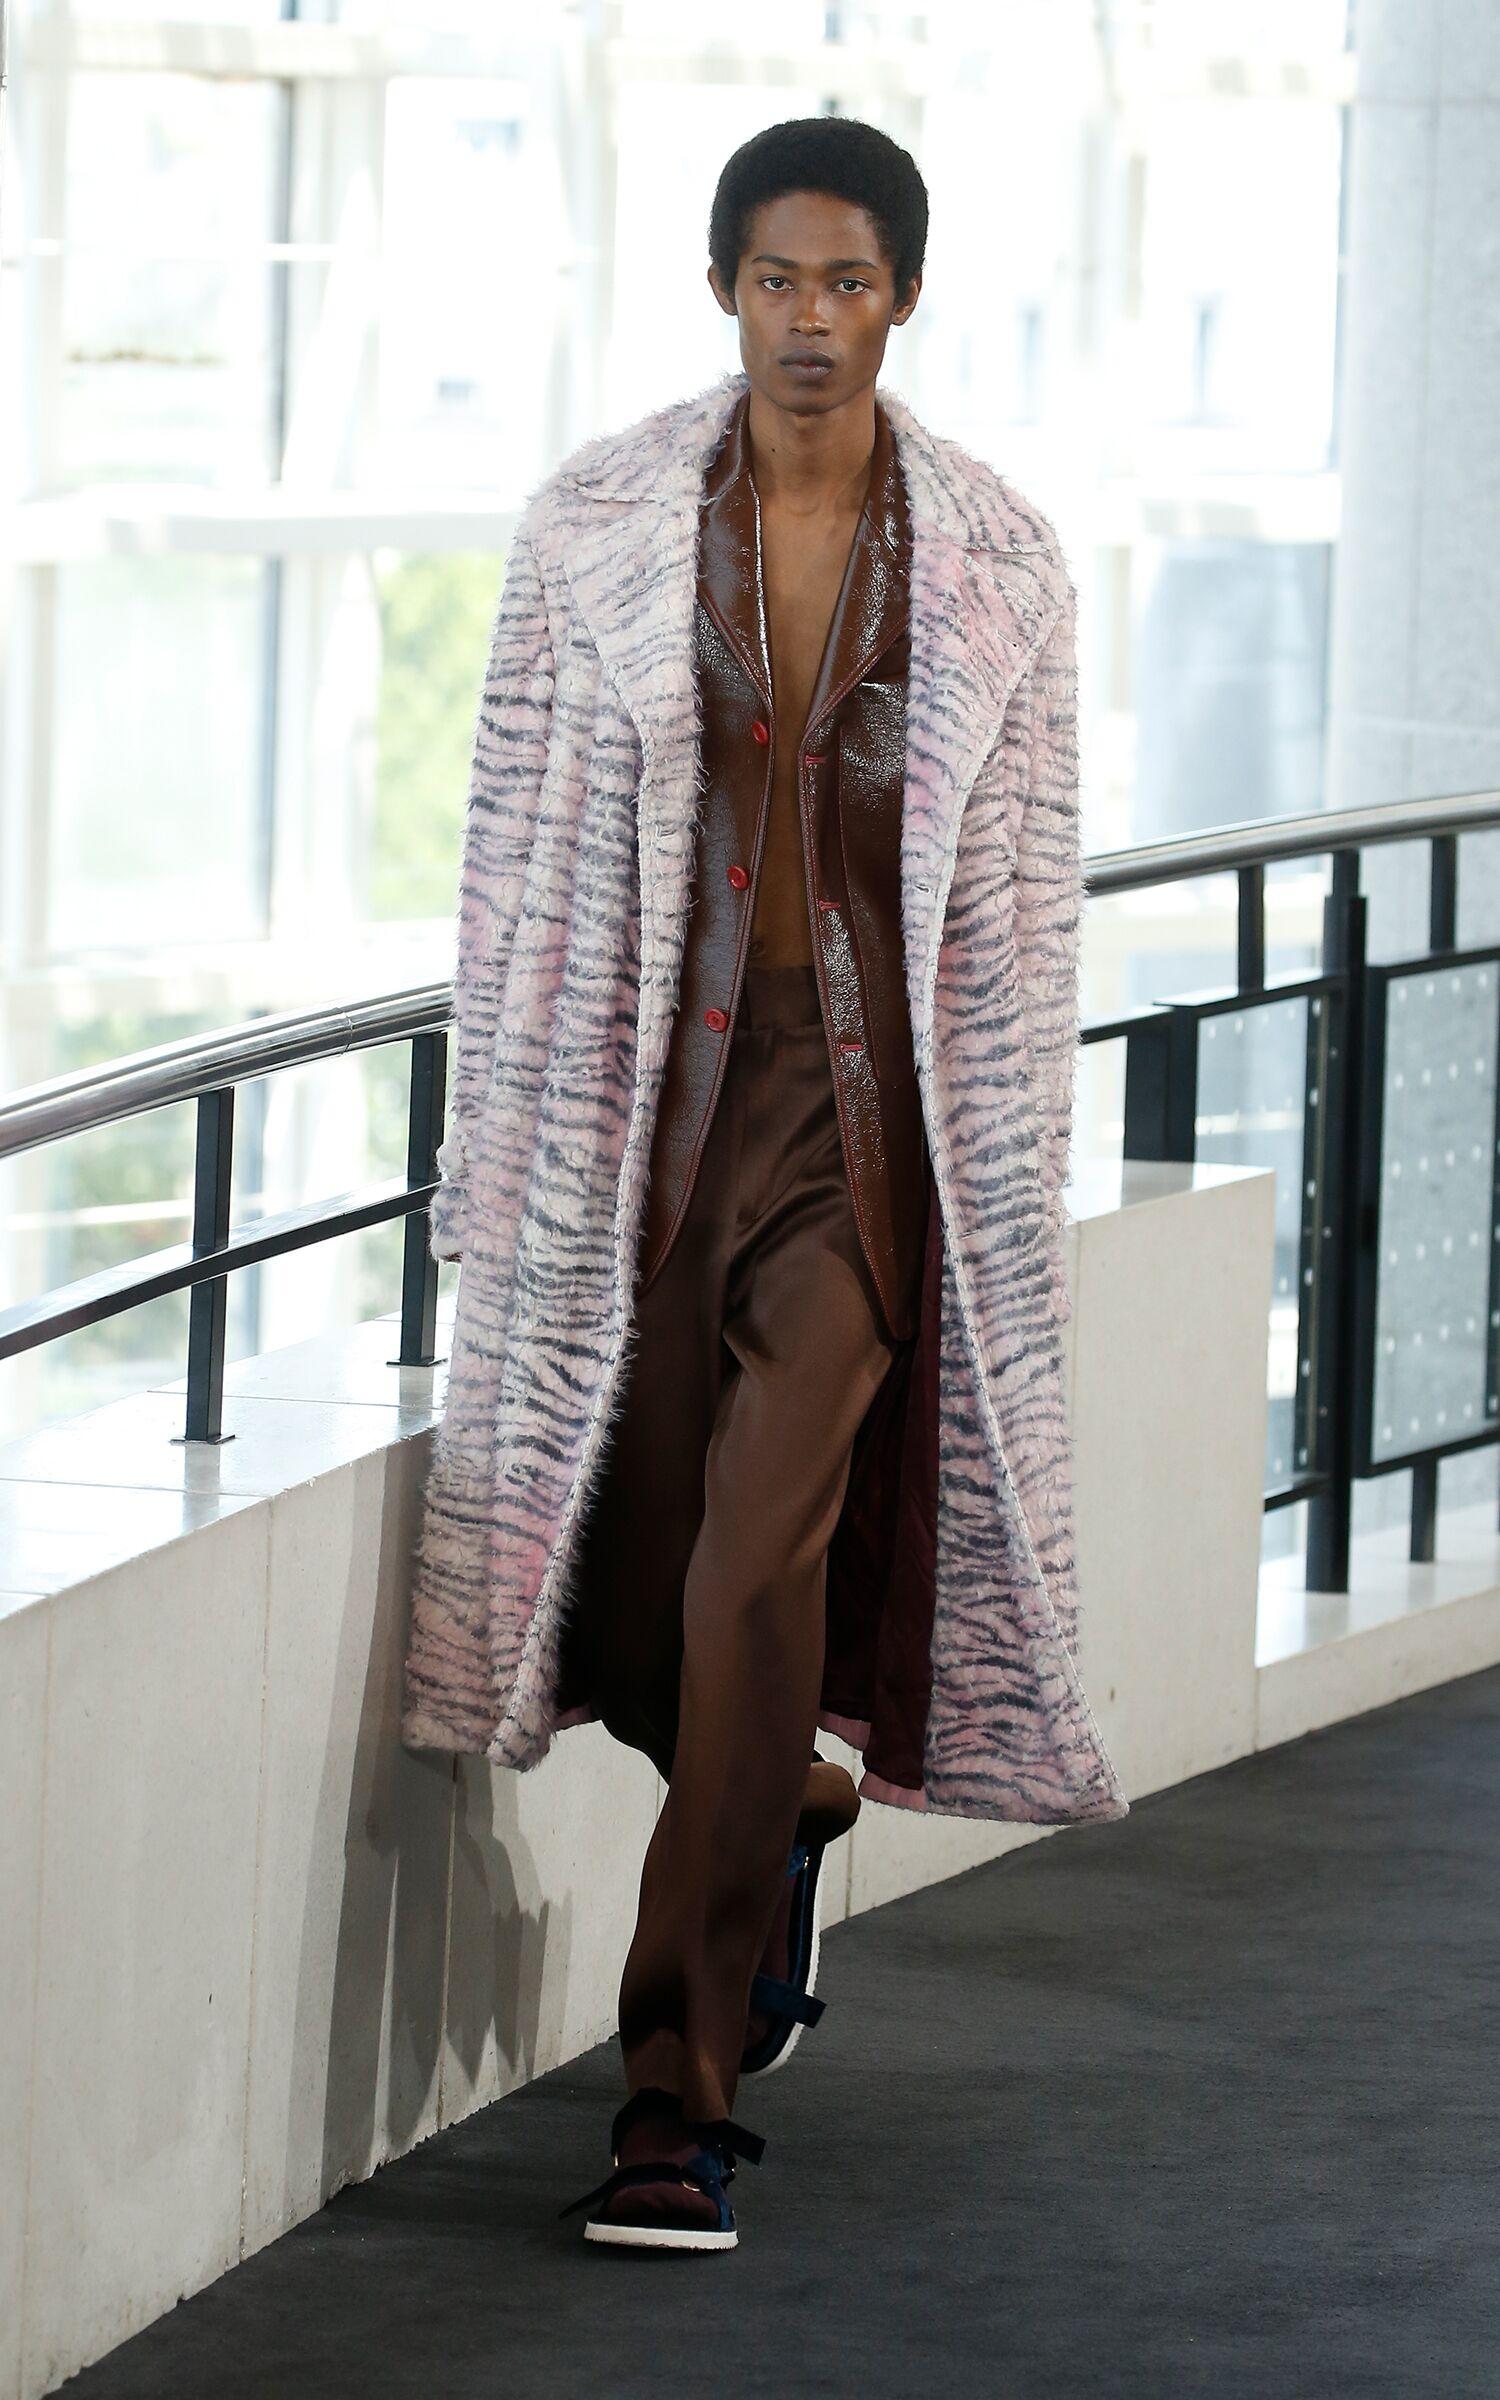 Fashion Model Man Sies Marjan Catwalk